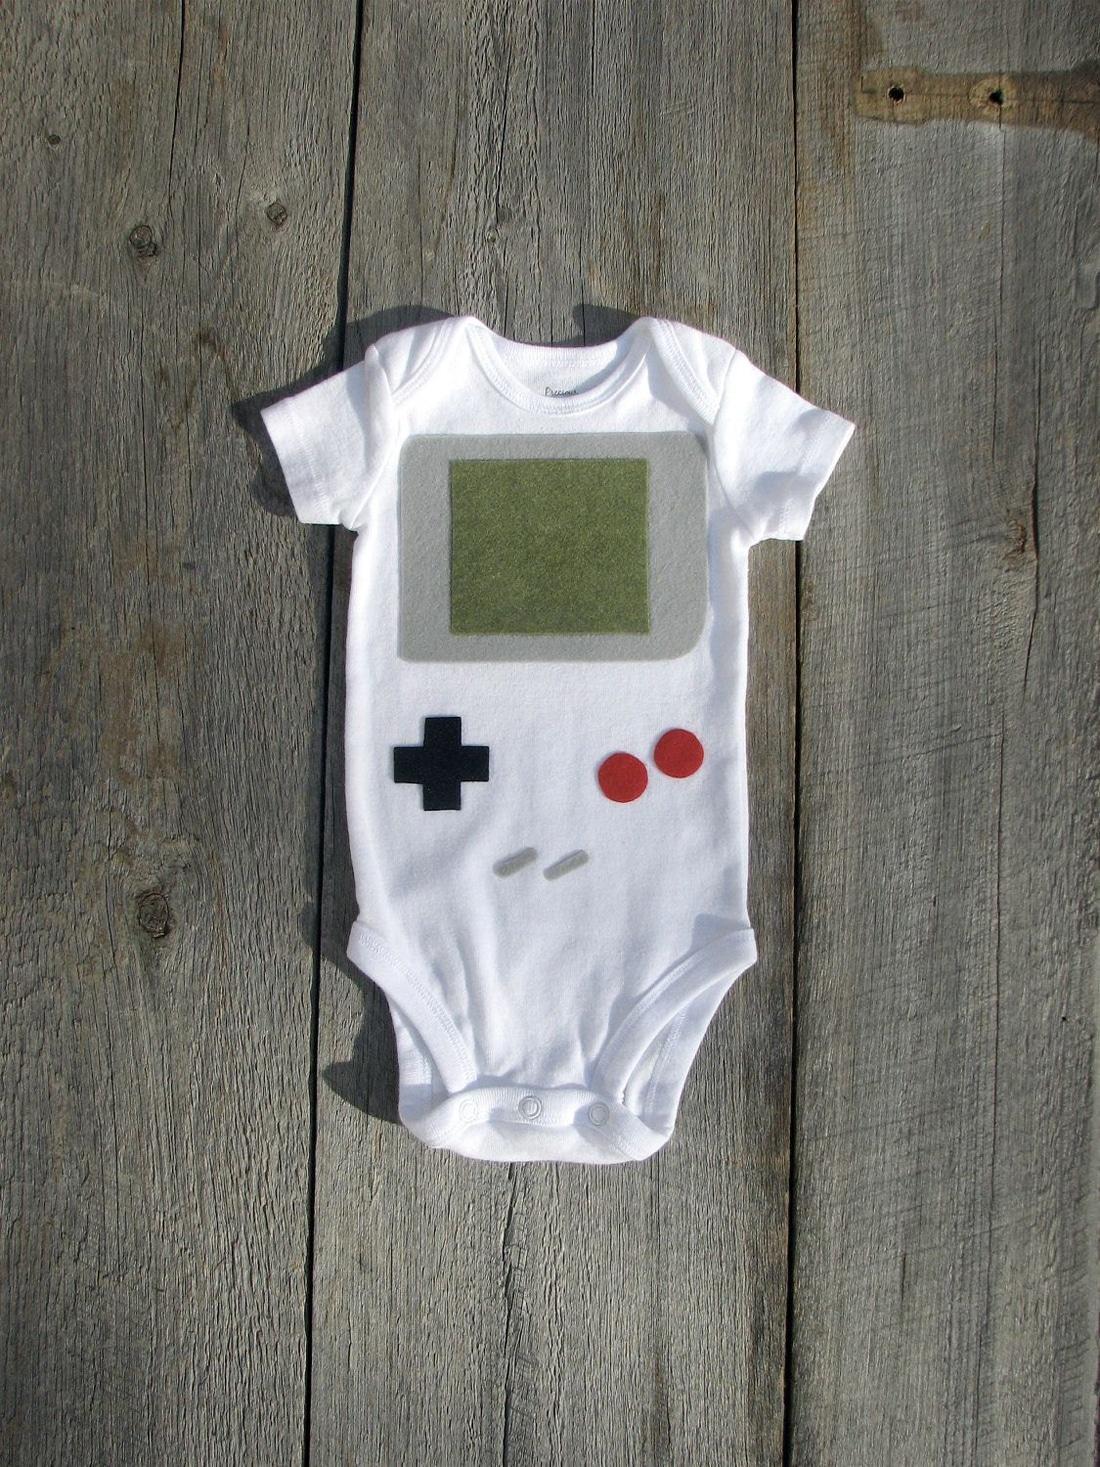 Nintendo-Gameboy-Baby-Onesie-Costume